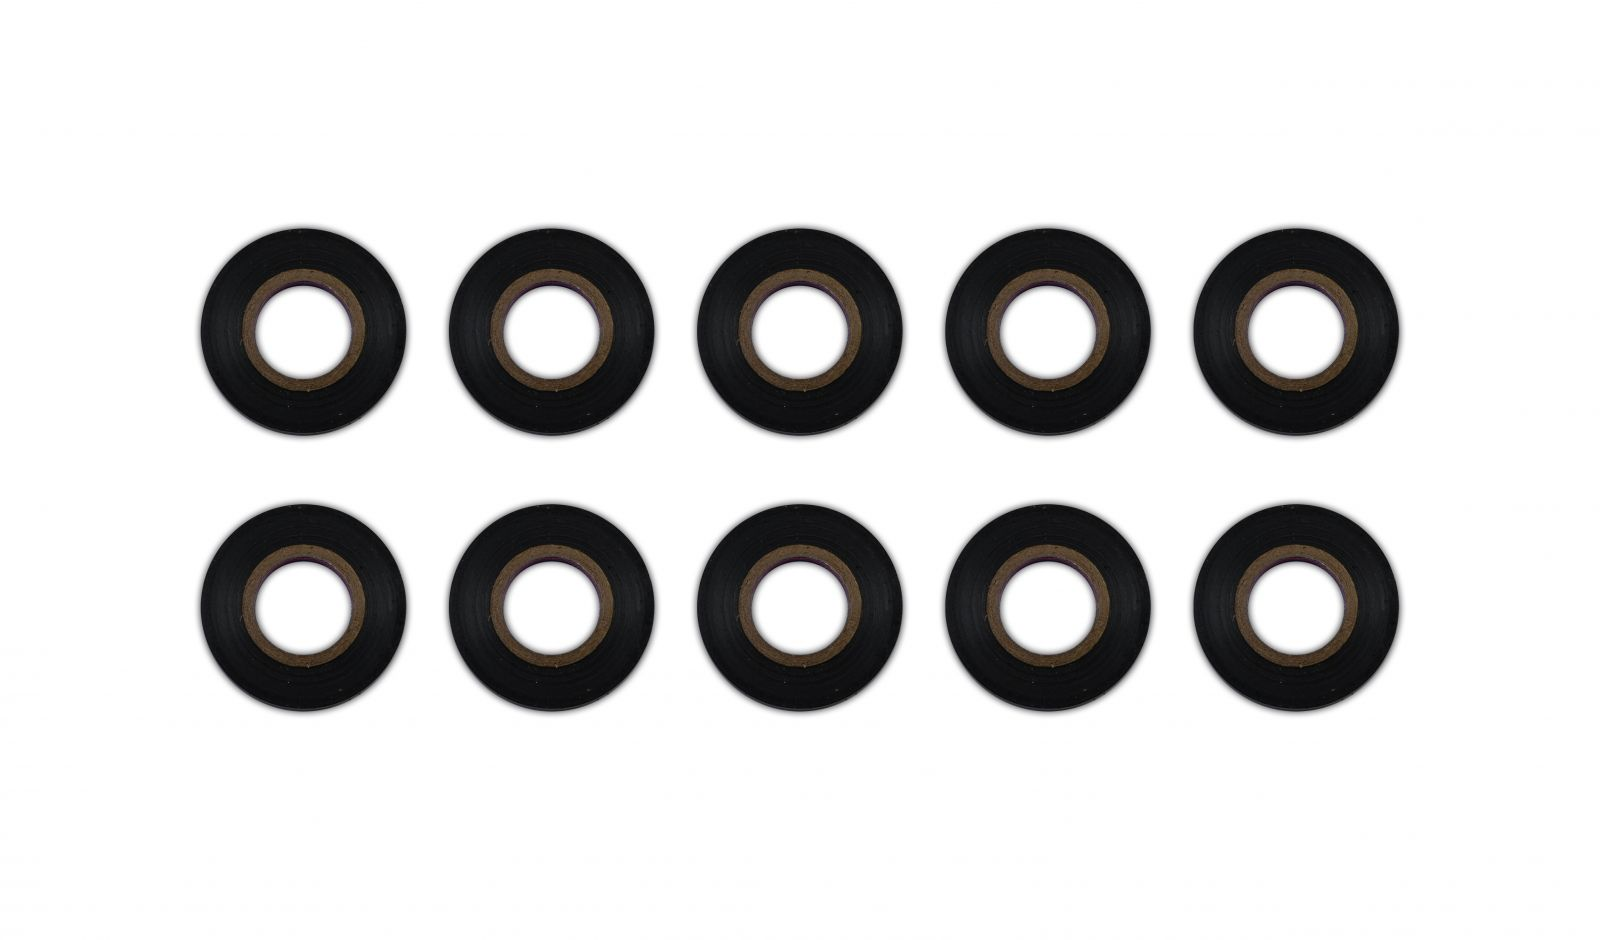 Adhesive Tapes - 697250H image